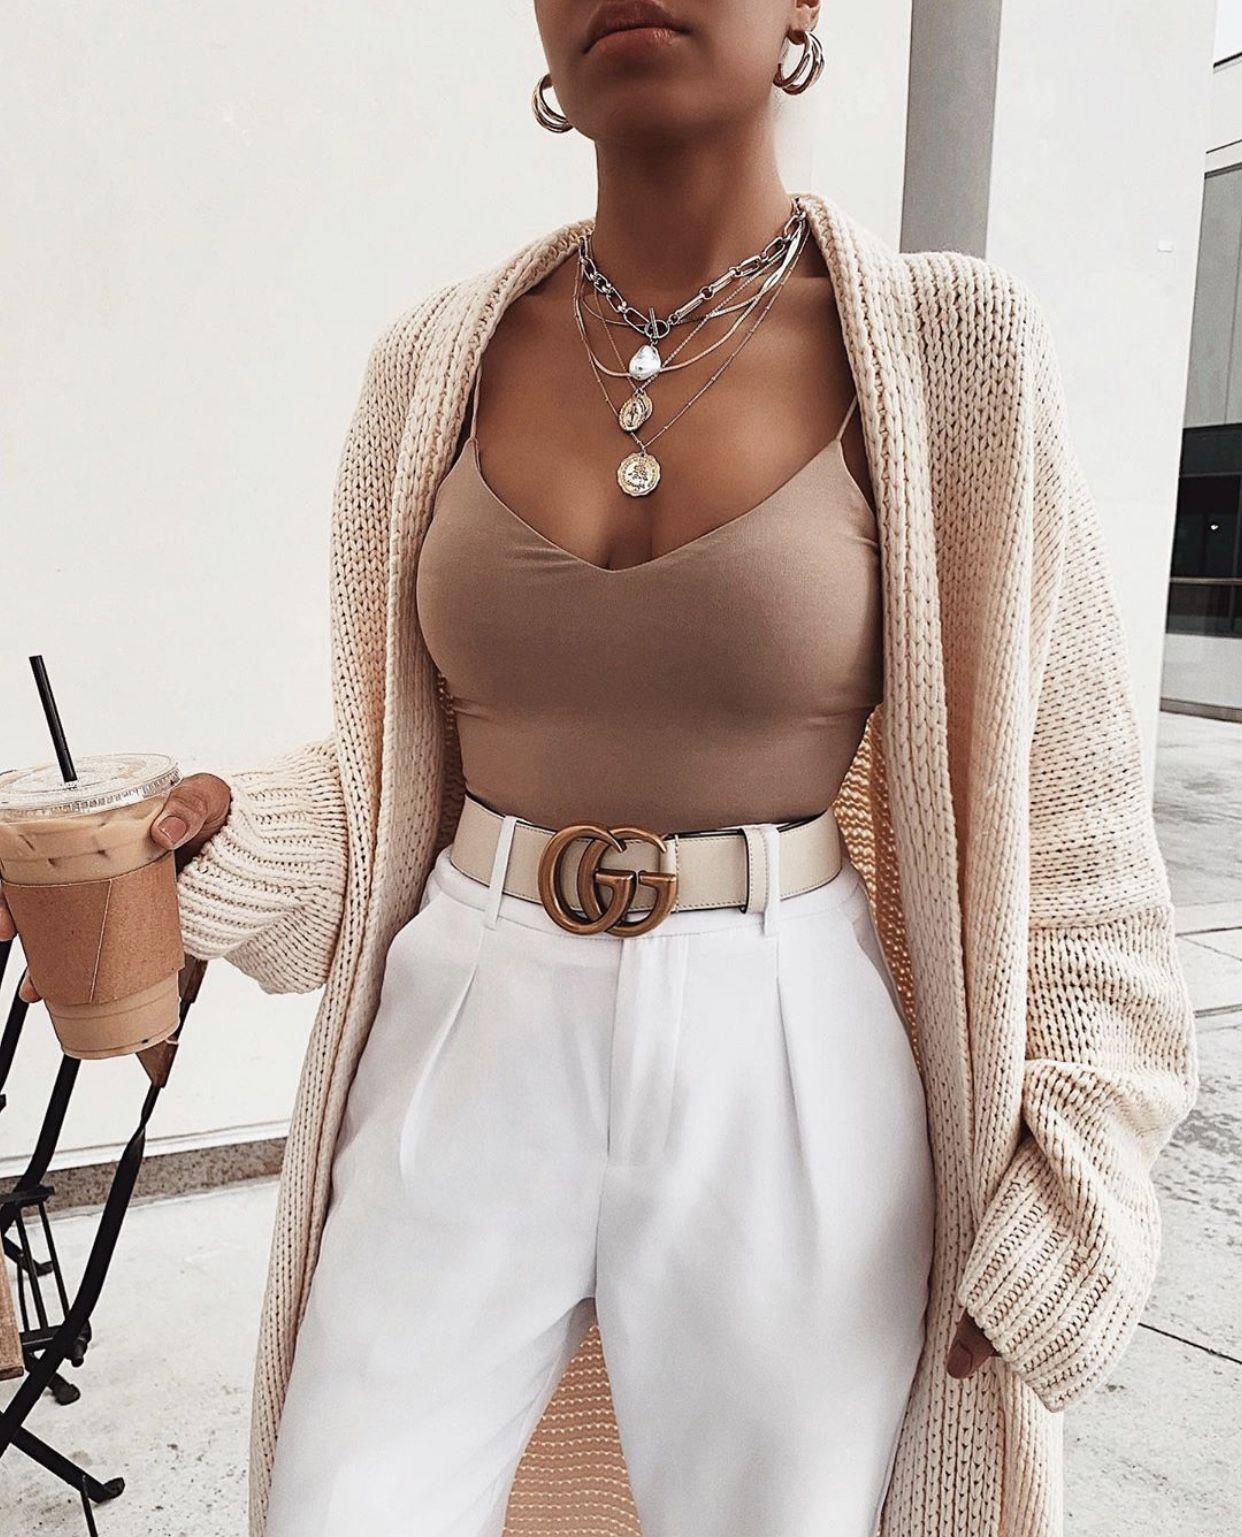 ͘—𝘪𝘯𝘵𝘦𝘳𝘦𝘴𝘵 ͘¯ð˜ªð˜¤ð˜°ð˜ð˜¦ð˜¤ð˜¢ð˜¯ð˜¤ð˜©ð˜°ð˜ð˜¢ð˜¢ ͘ð˜°ð˜¶ð˜µð˜¶ð˜£ð˜¦ ͘¯ð˜ªð˜¤ð˜°ð˜ð˜¦ð˜¤ð˜¢ð˜¯ð˜¤ð˜©ð˜°ð˜ð˜¢ In 2020 Popular Outfits Winter Fashion Outfits Fashion Inspo Outfits